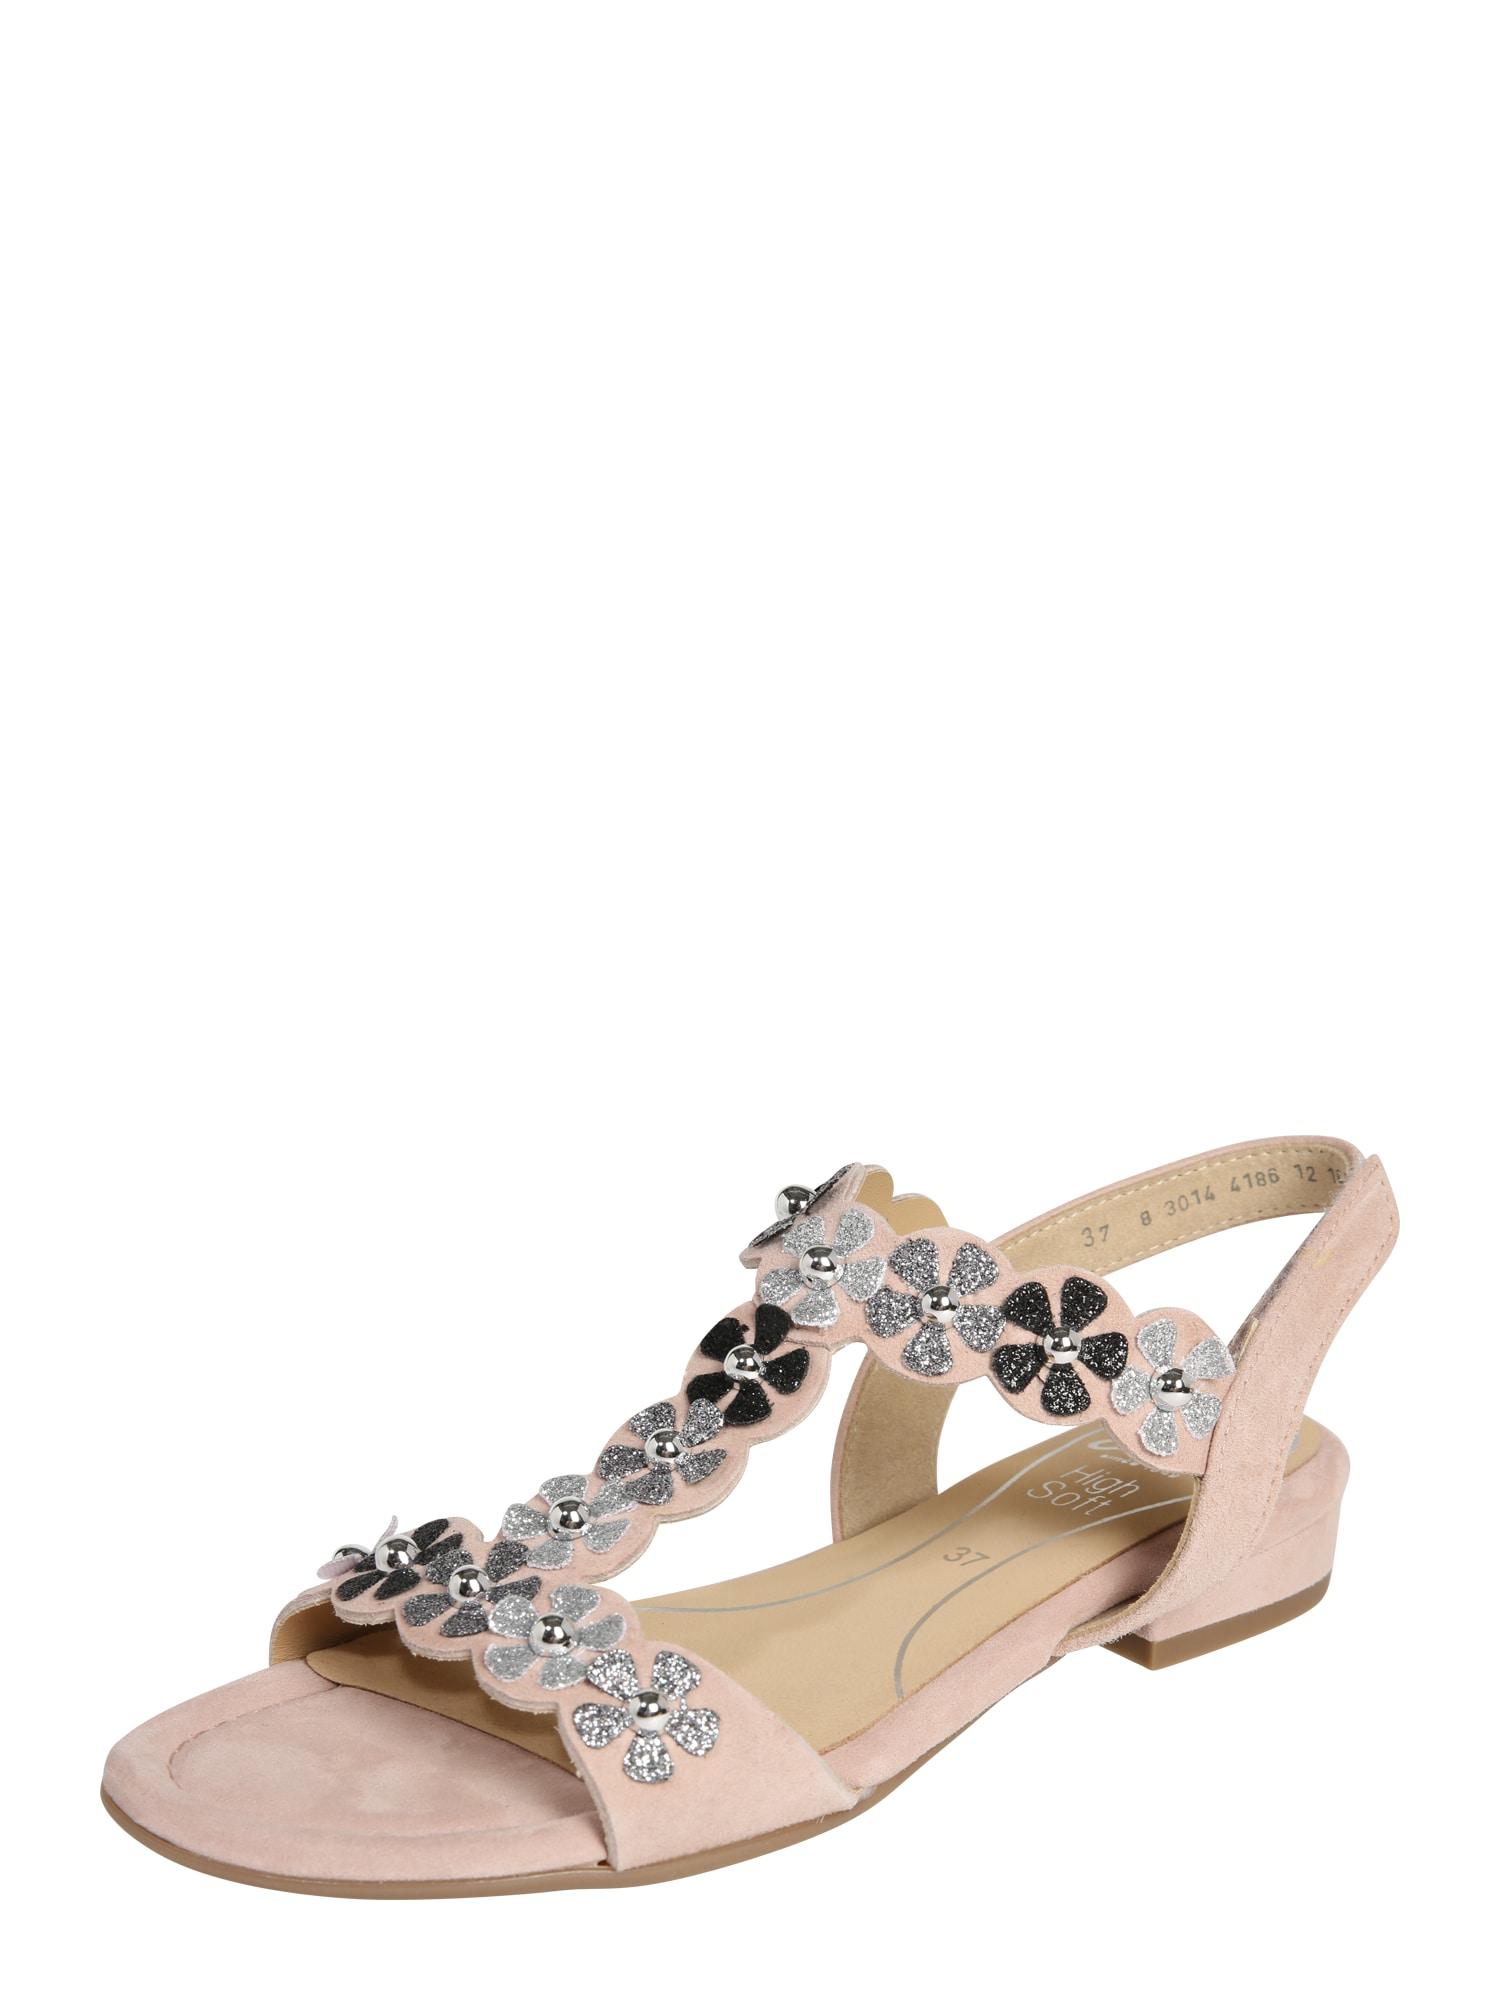 Sandály Vegas béžová stříbrná ARA